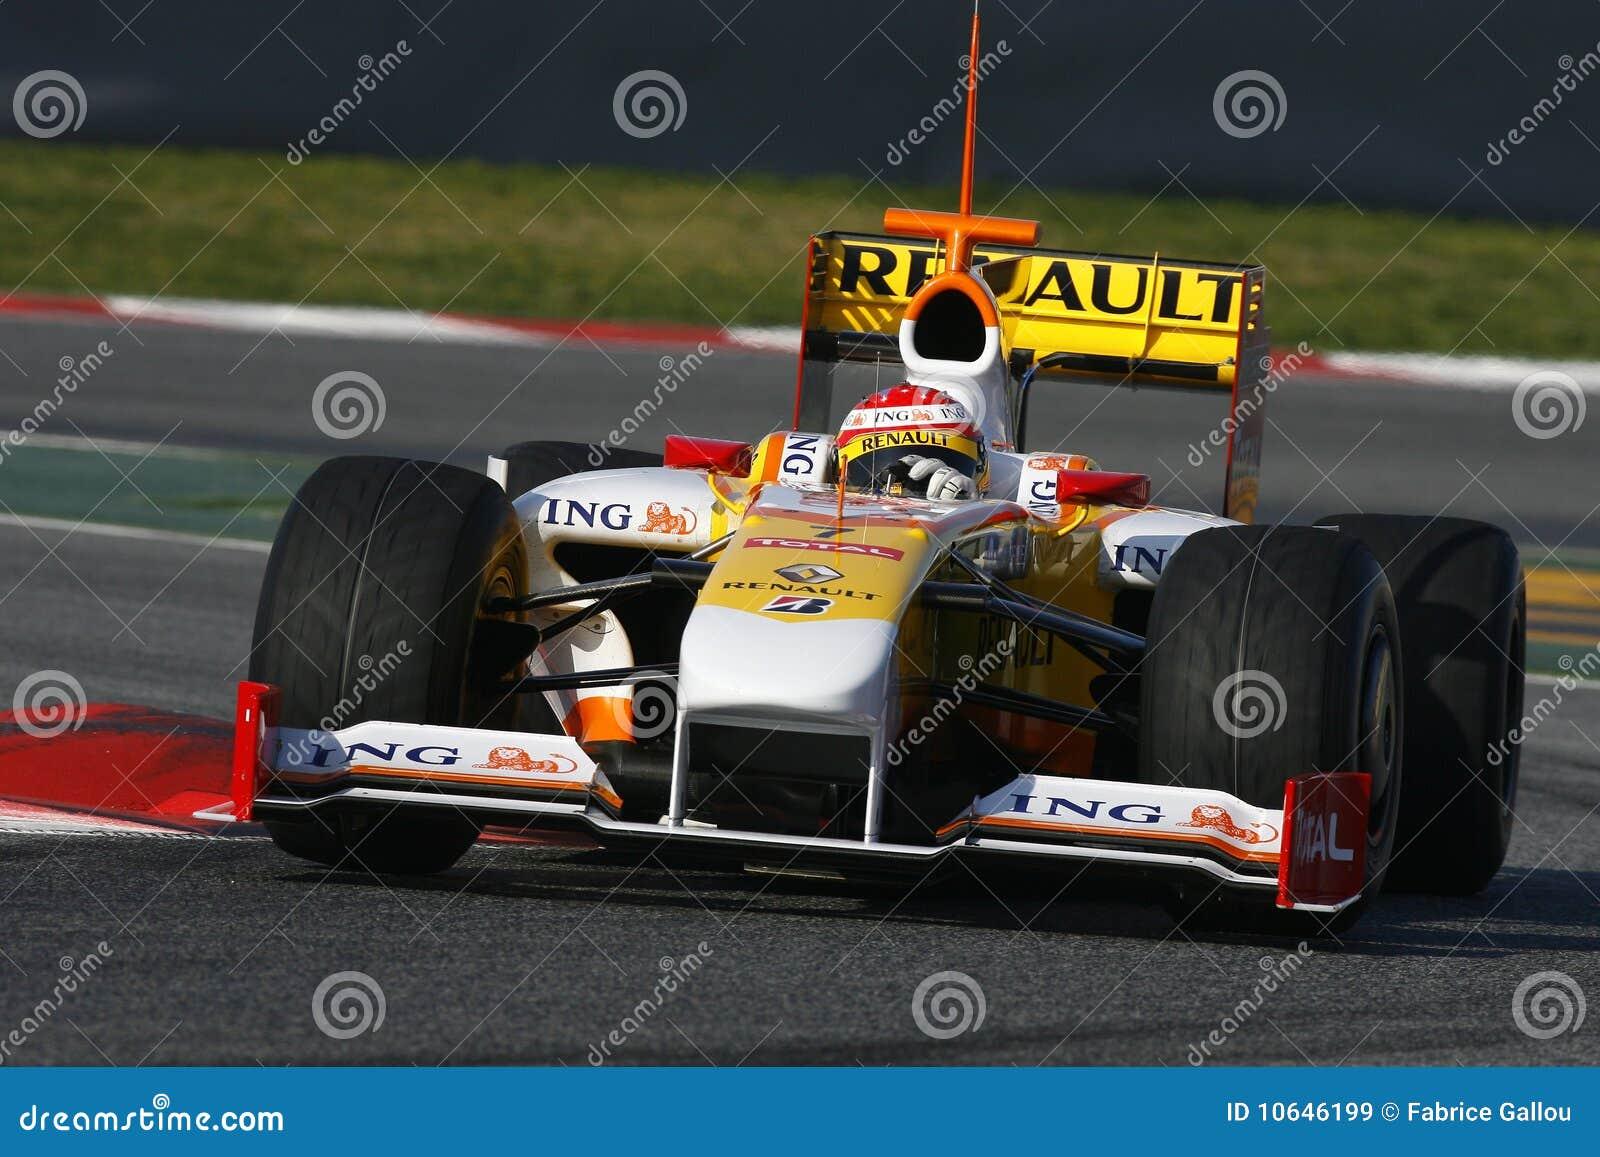 F1 2009 - Fernando Alonso Renault